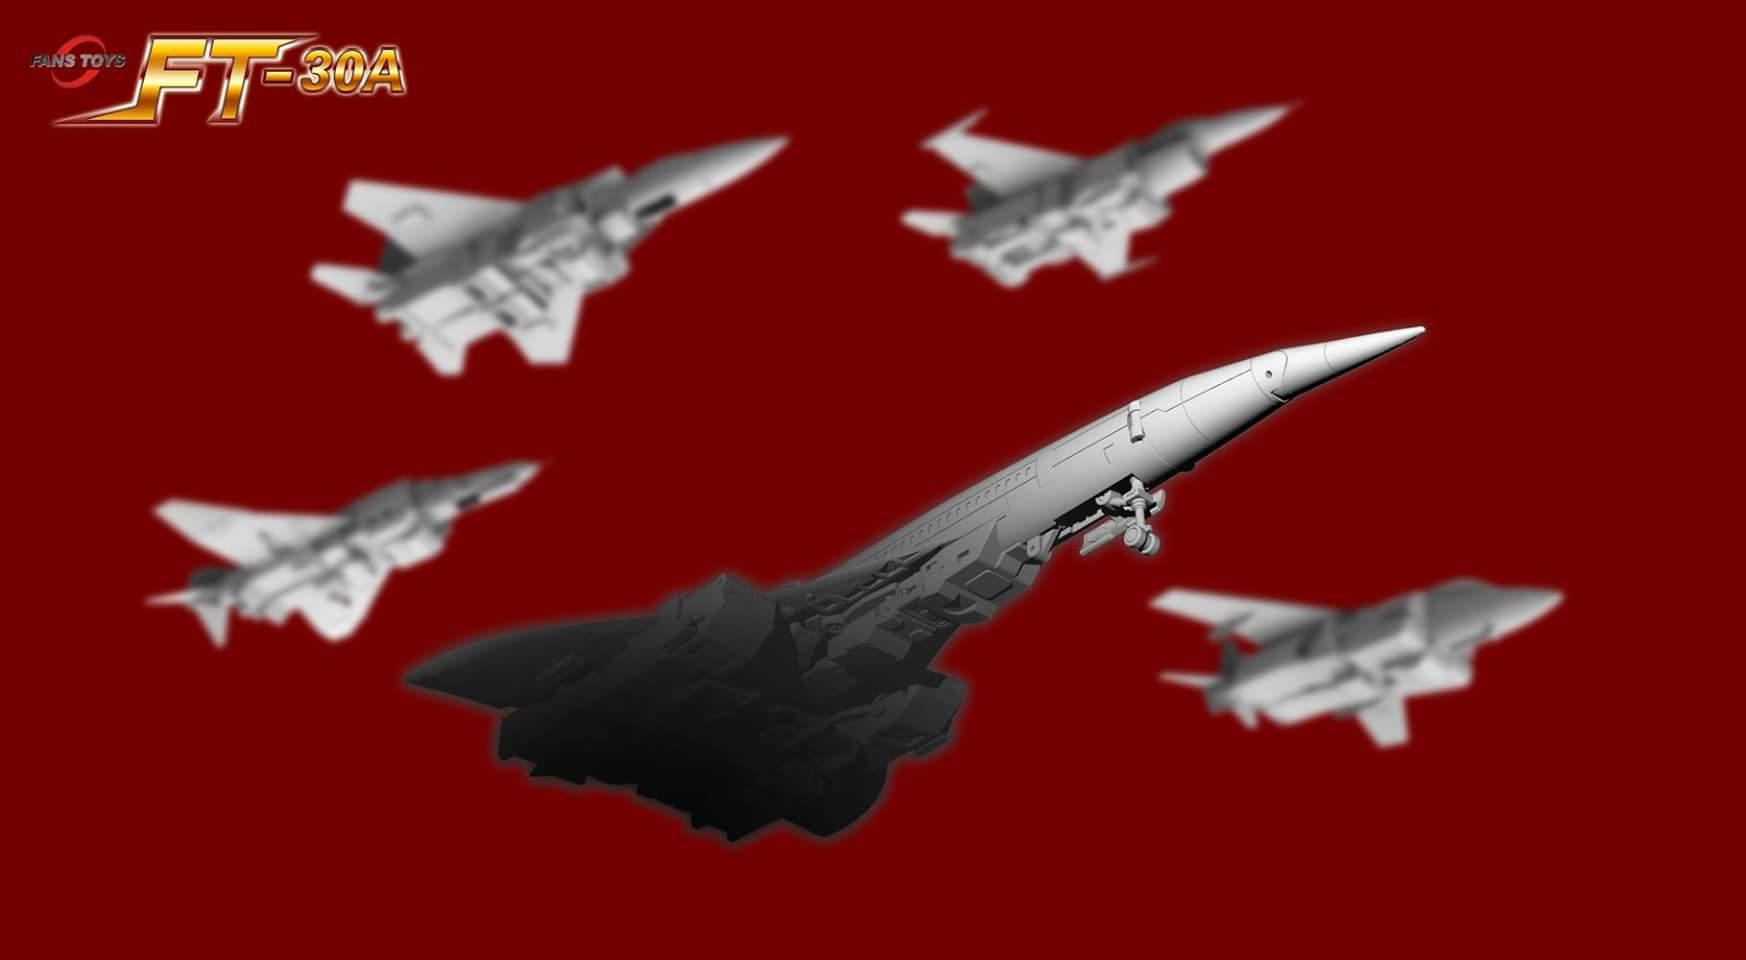 [Fanstoys] Produit Tiers - Jouet FT-30 Ethereaon (FT-30A à FT-30E) - aka Superion 44hiitQD_o